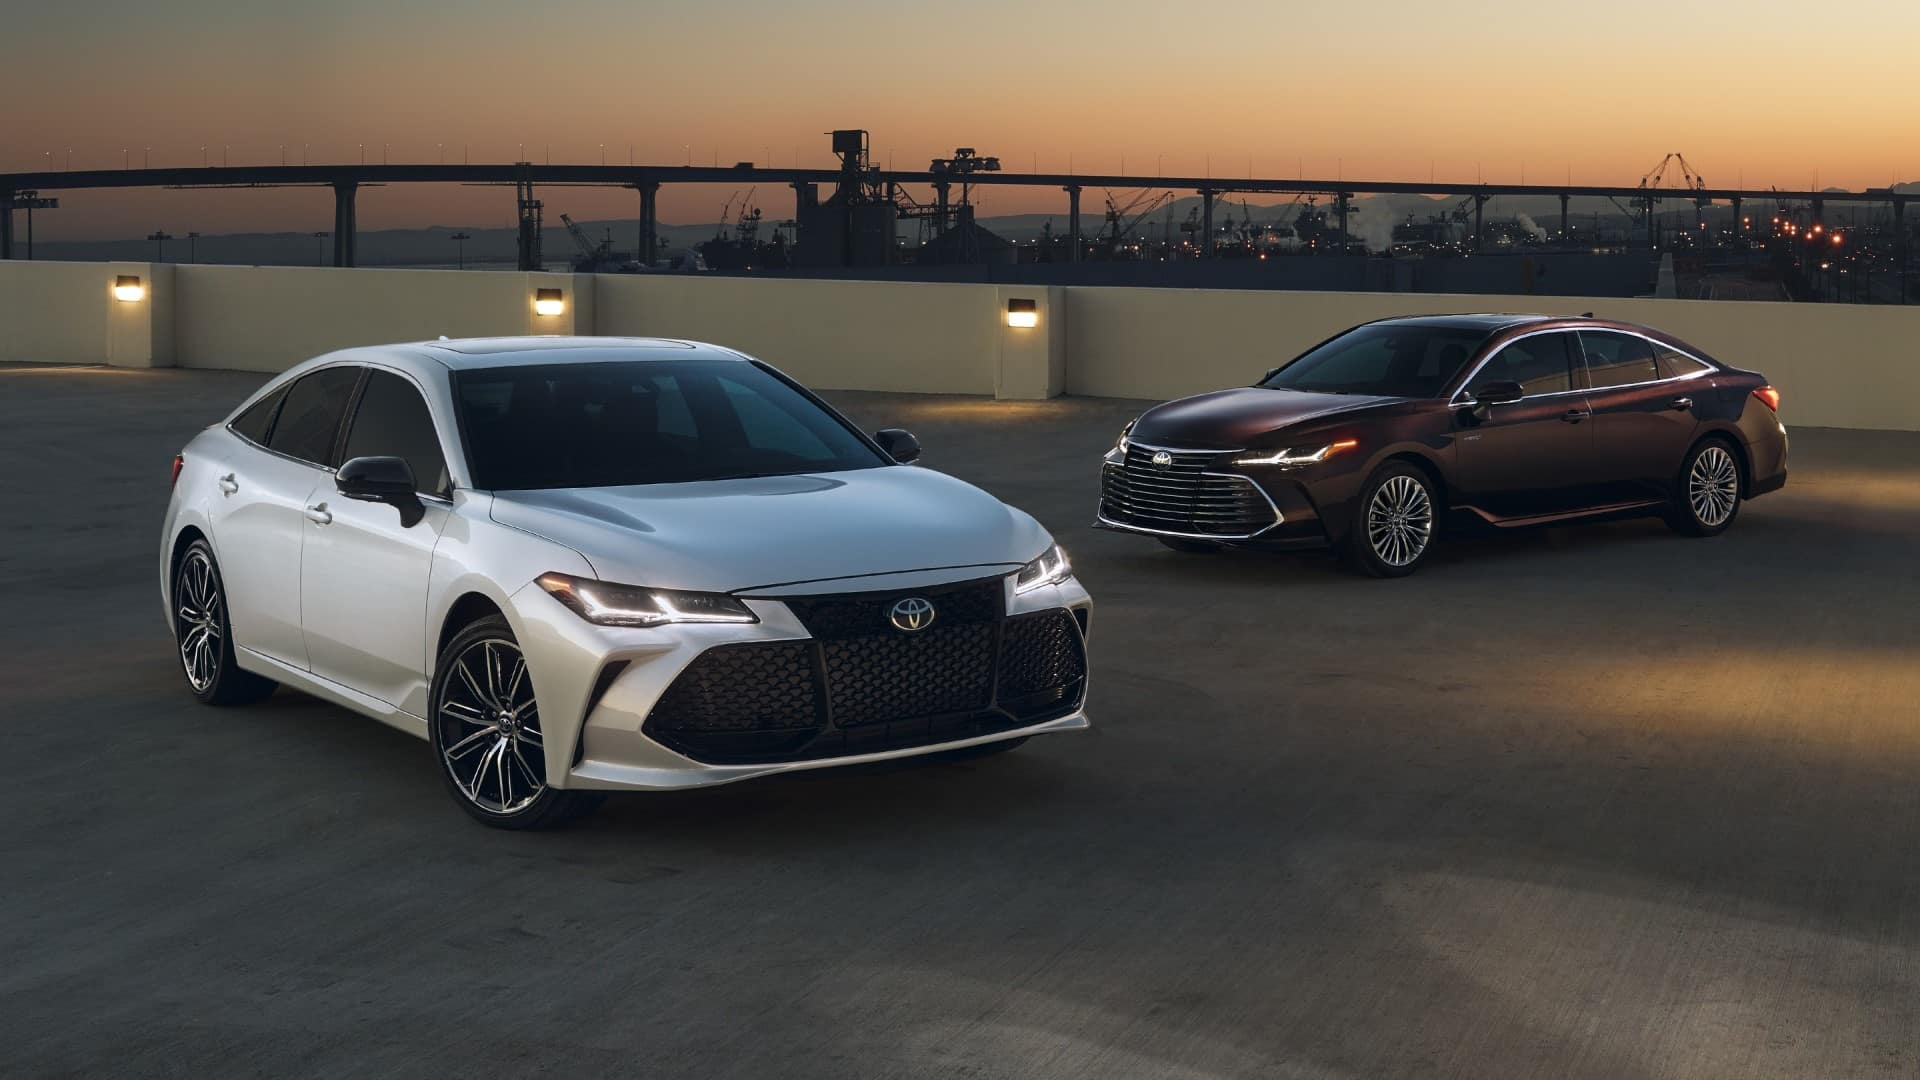 Toyota_Avalon_Parked_On_Parking_Garage